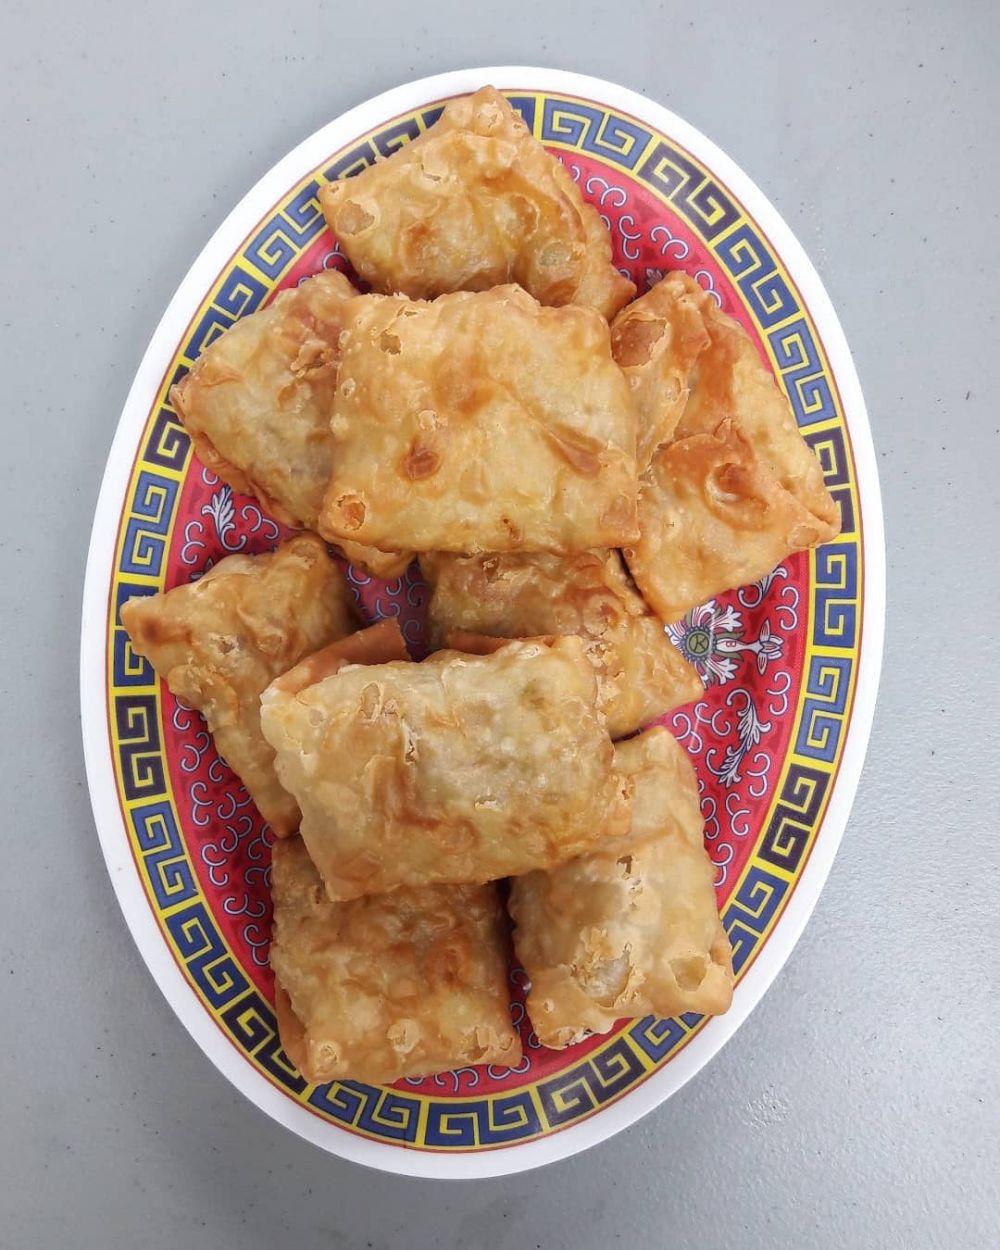 15 Resep makanan khas Palembang terkenal, enak, dan praktis instagram